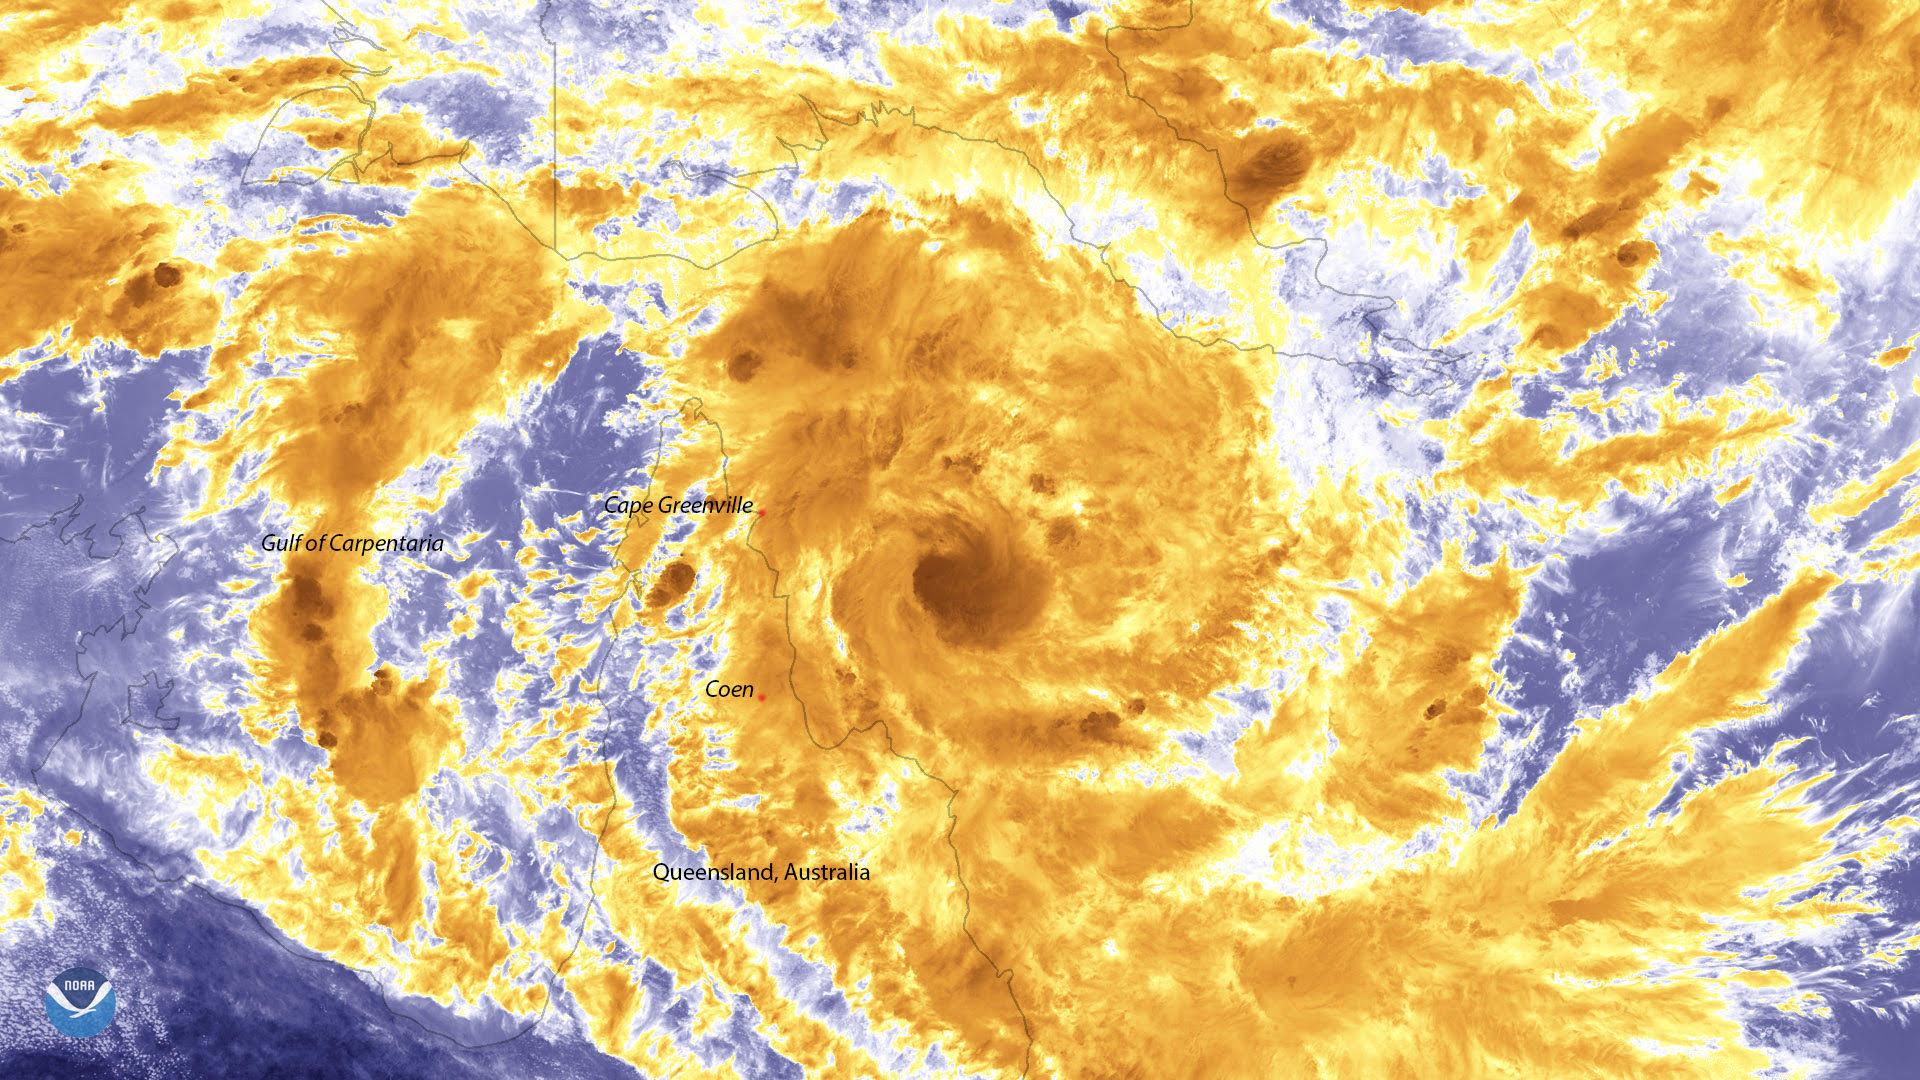 https://www.nesdis.noaa.gov/sites/default/files/20190318_tropical_cyclone.jpg